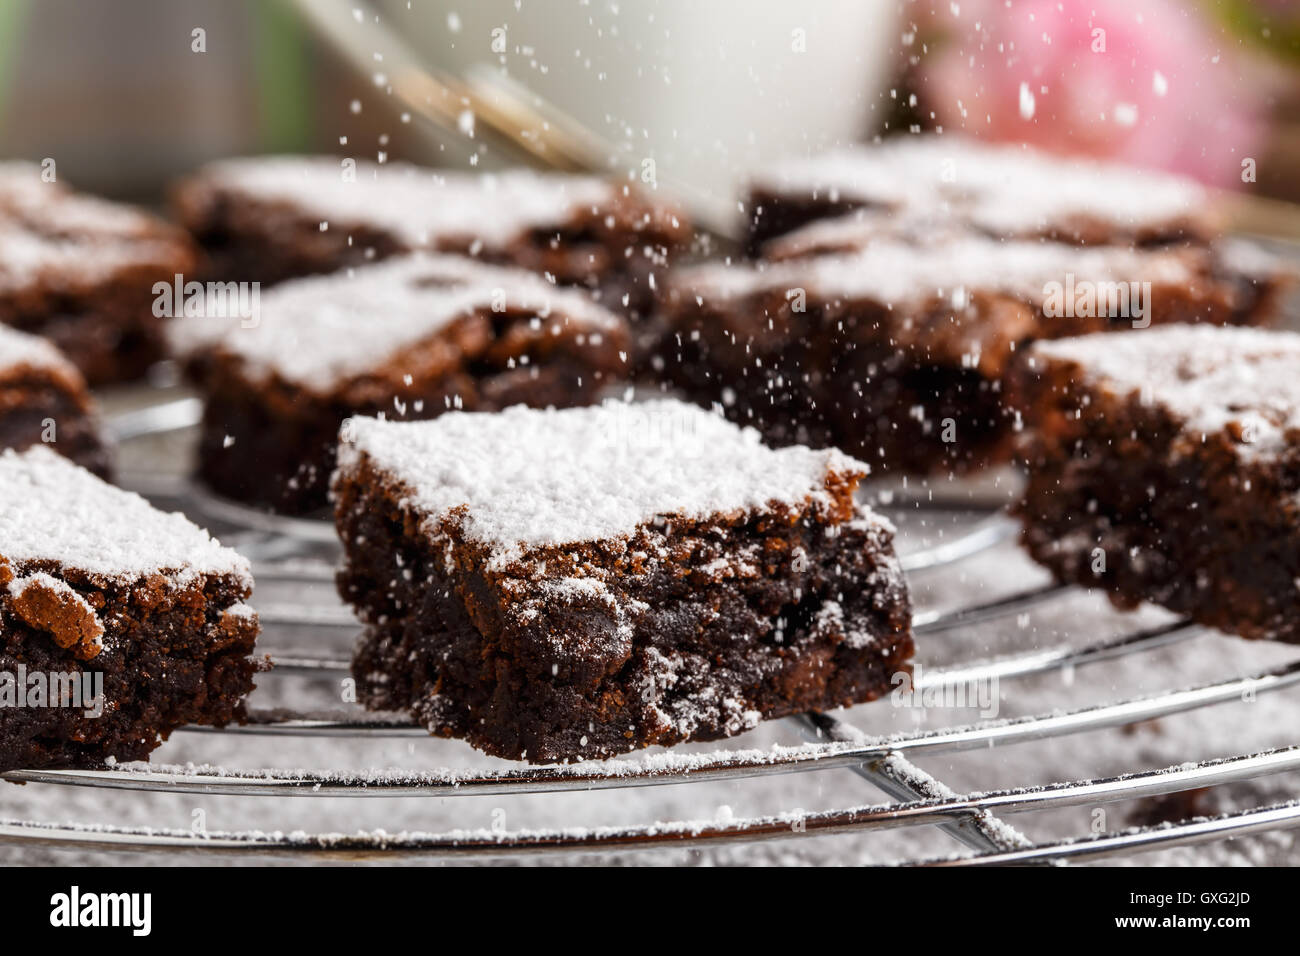 homemade chocolate brownies with icing sugar on a cake rack. Stock Photo